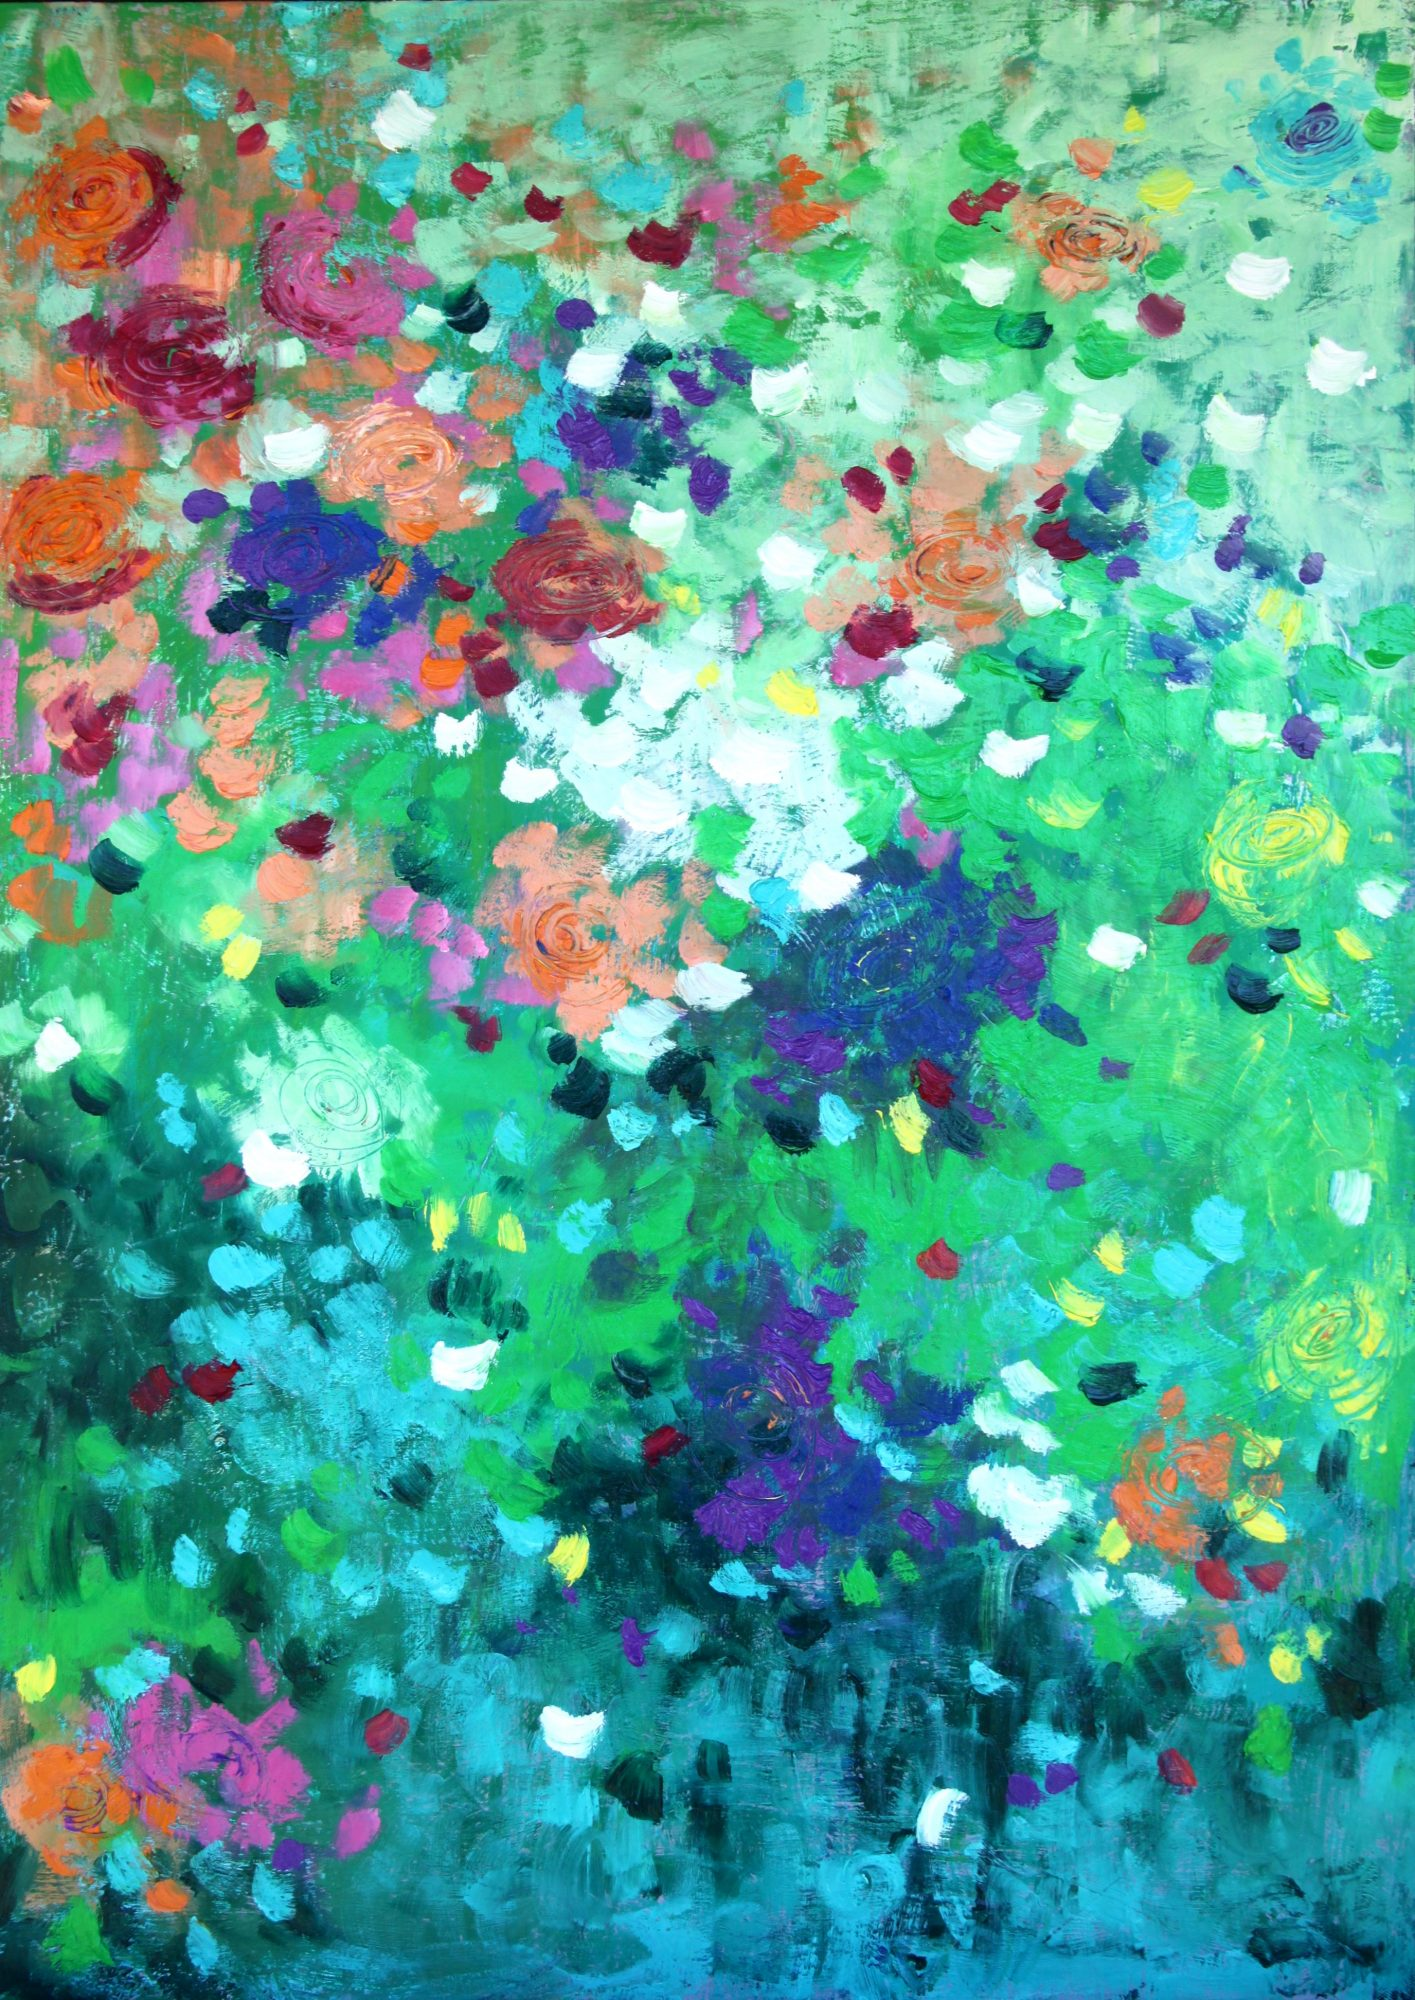 belinda-nadwie-art-sydney-artist-afternoon delight